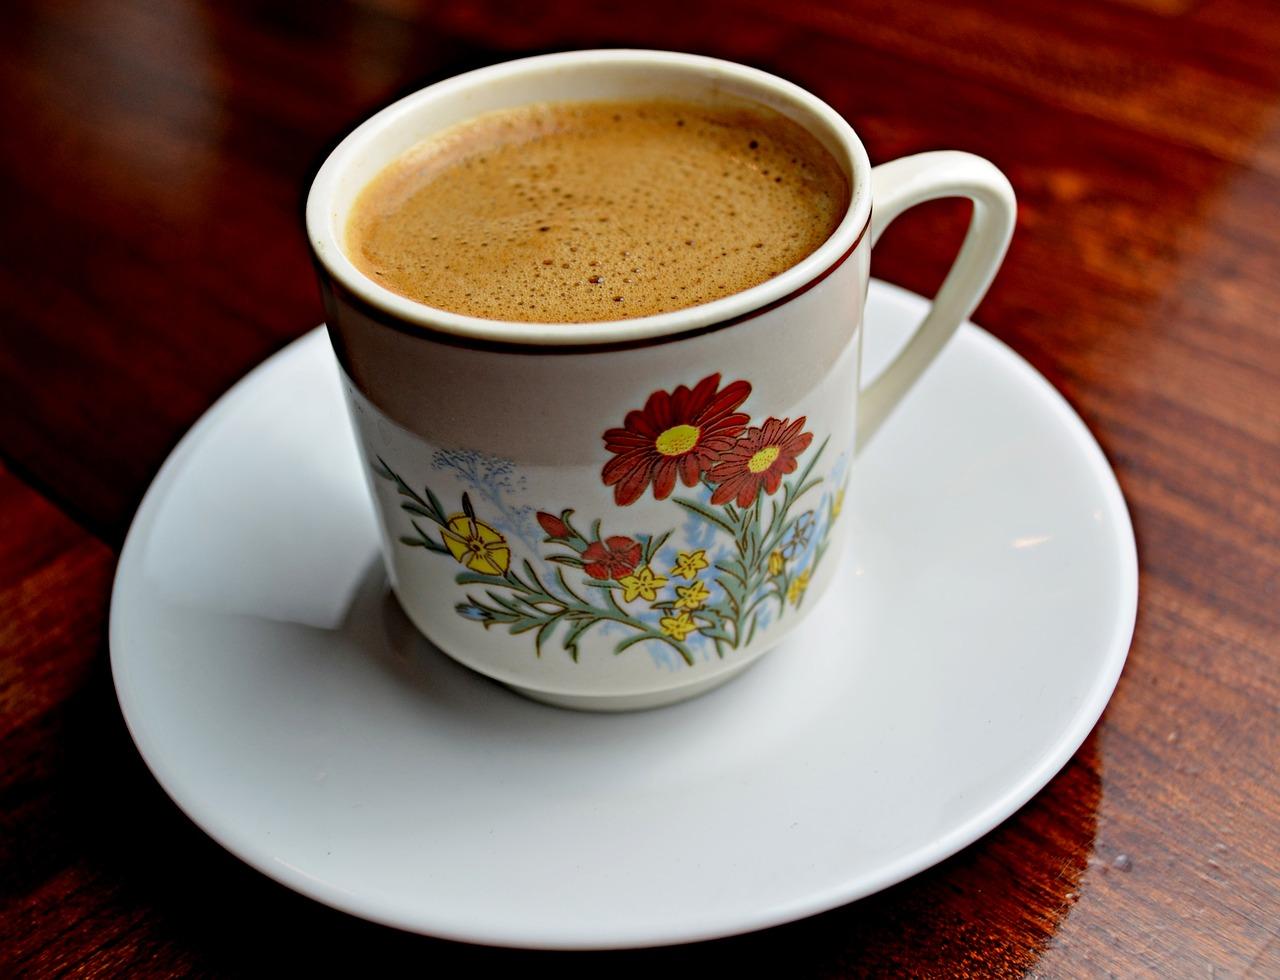 Espresso,coffee,bistro,cup,hot - free image from needpix.com